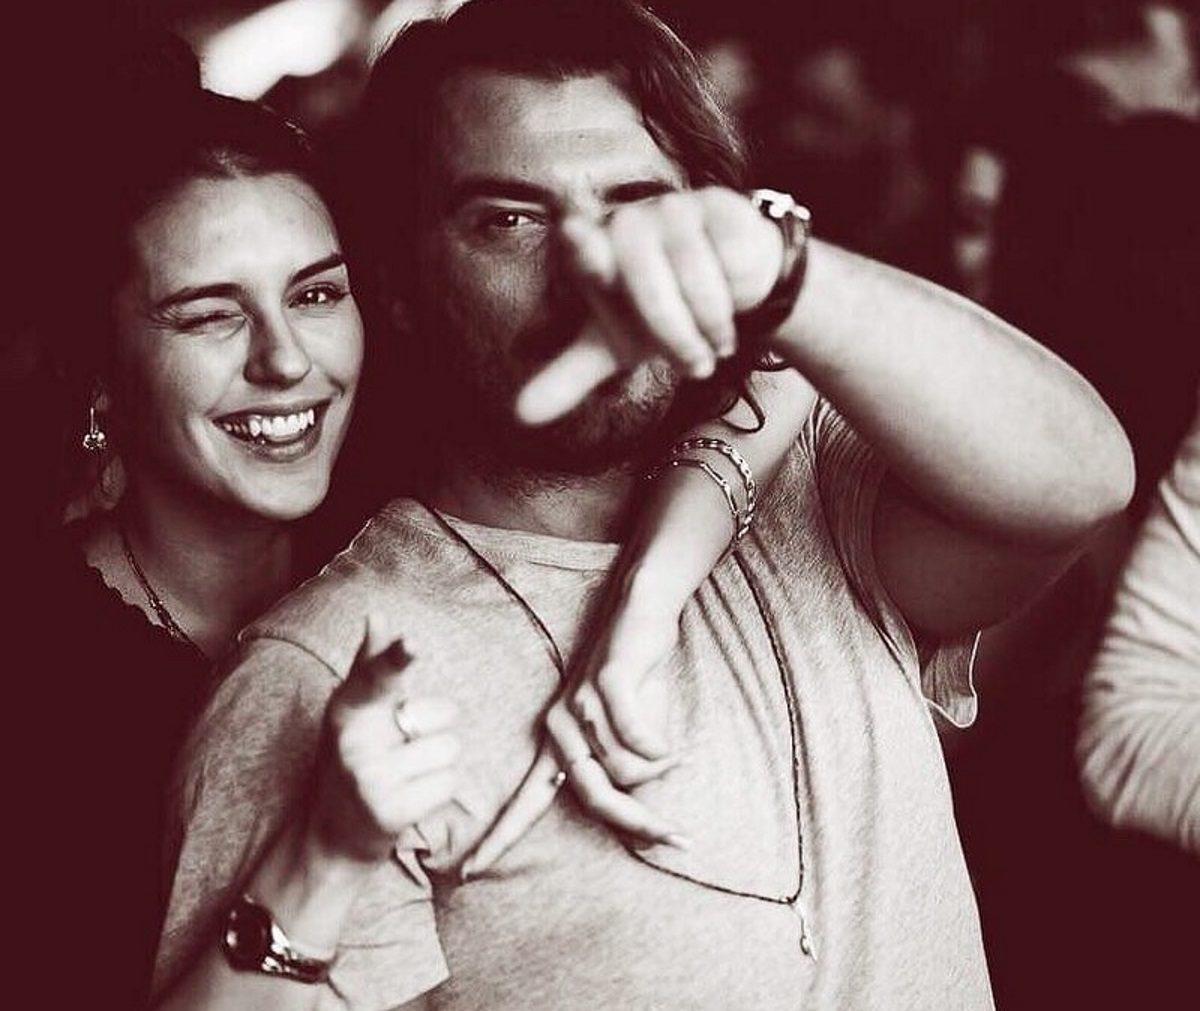 GNTM: Ο σύντροφος της Κάτιας ρίχνει τα «καρφιά» του! «Ο κόσμος εισπράττει μια στοχευμένη εικόνα…» | tlife.gr